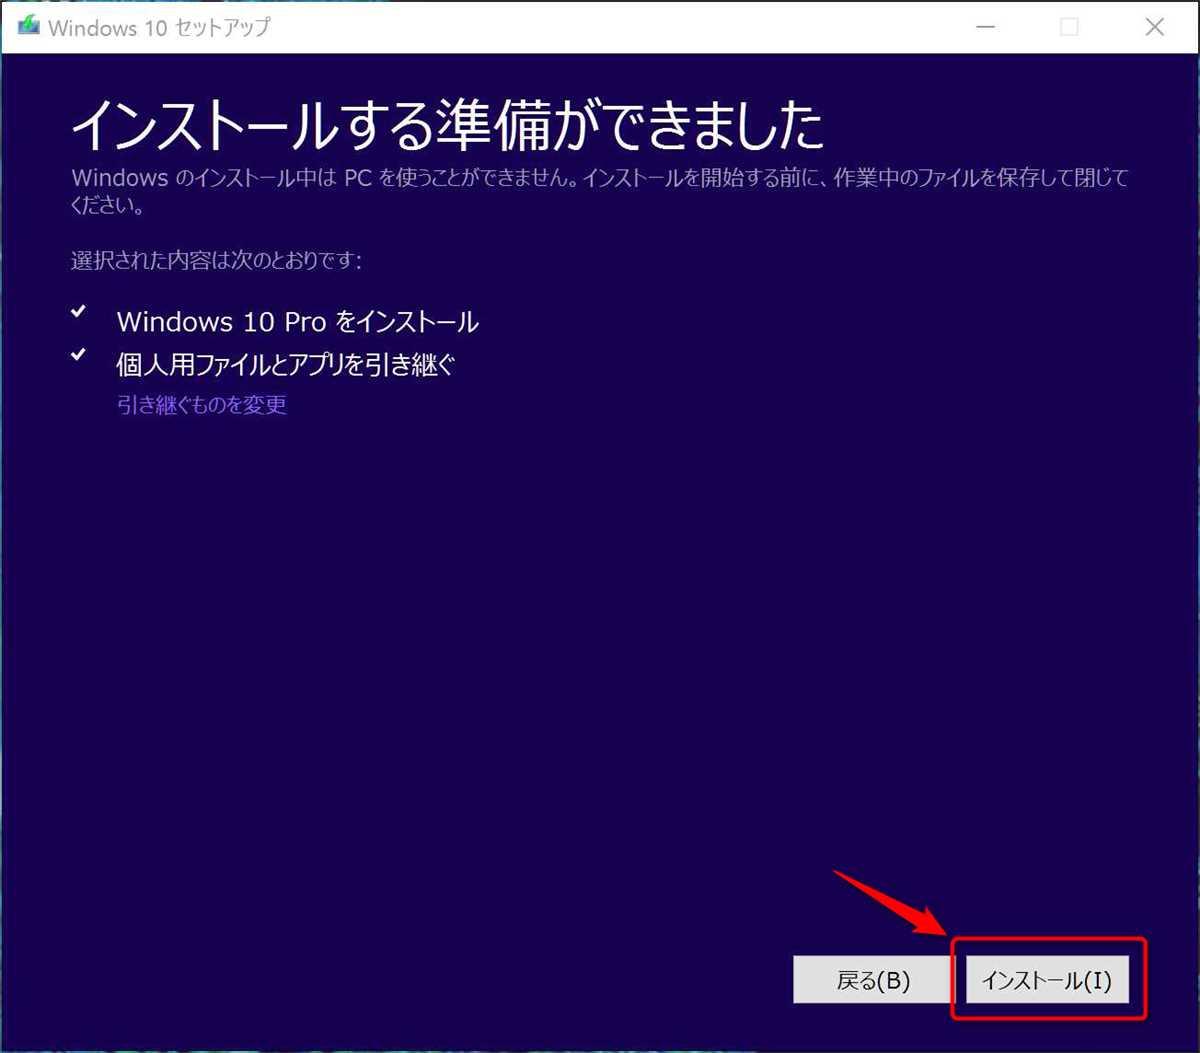 Apply Windows 10 Creators Update manually - 4